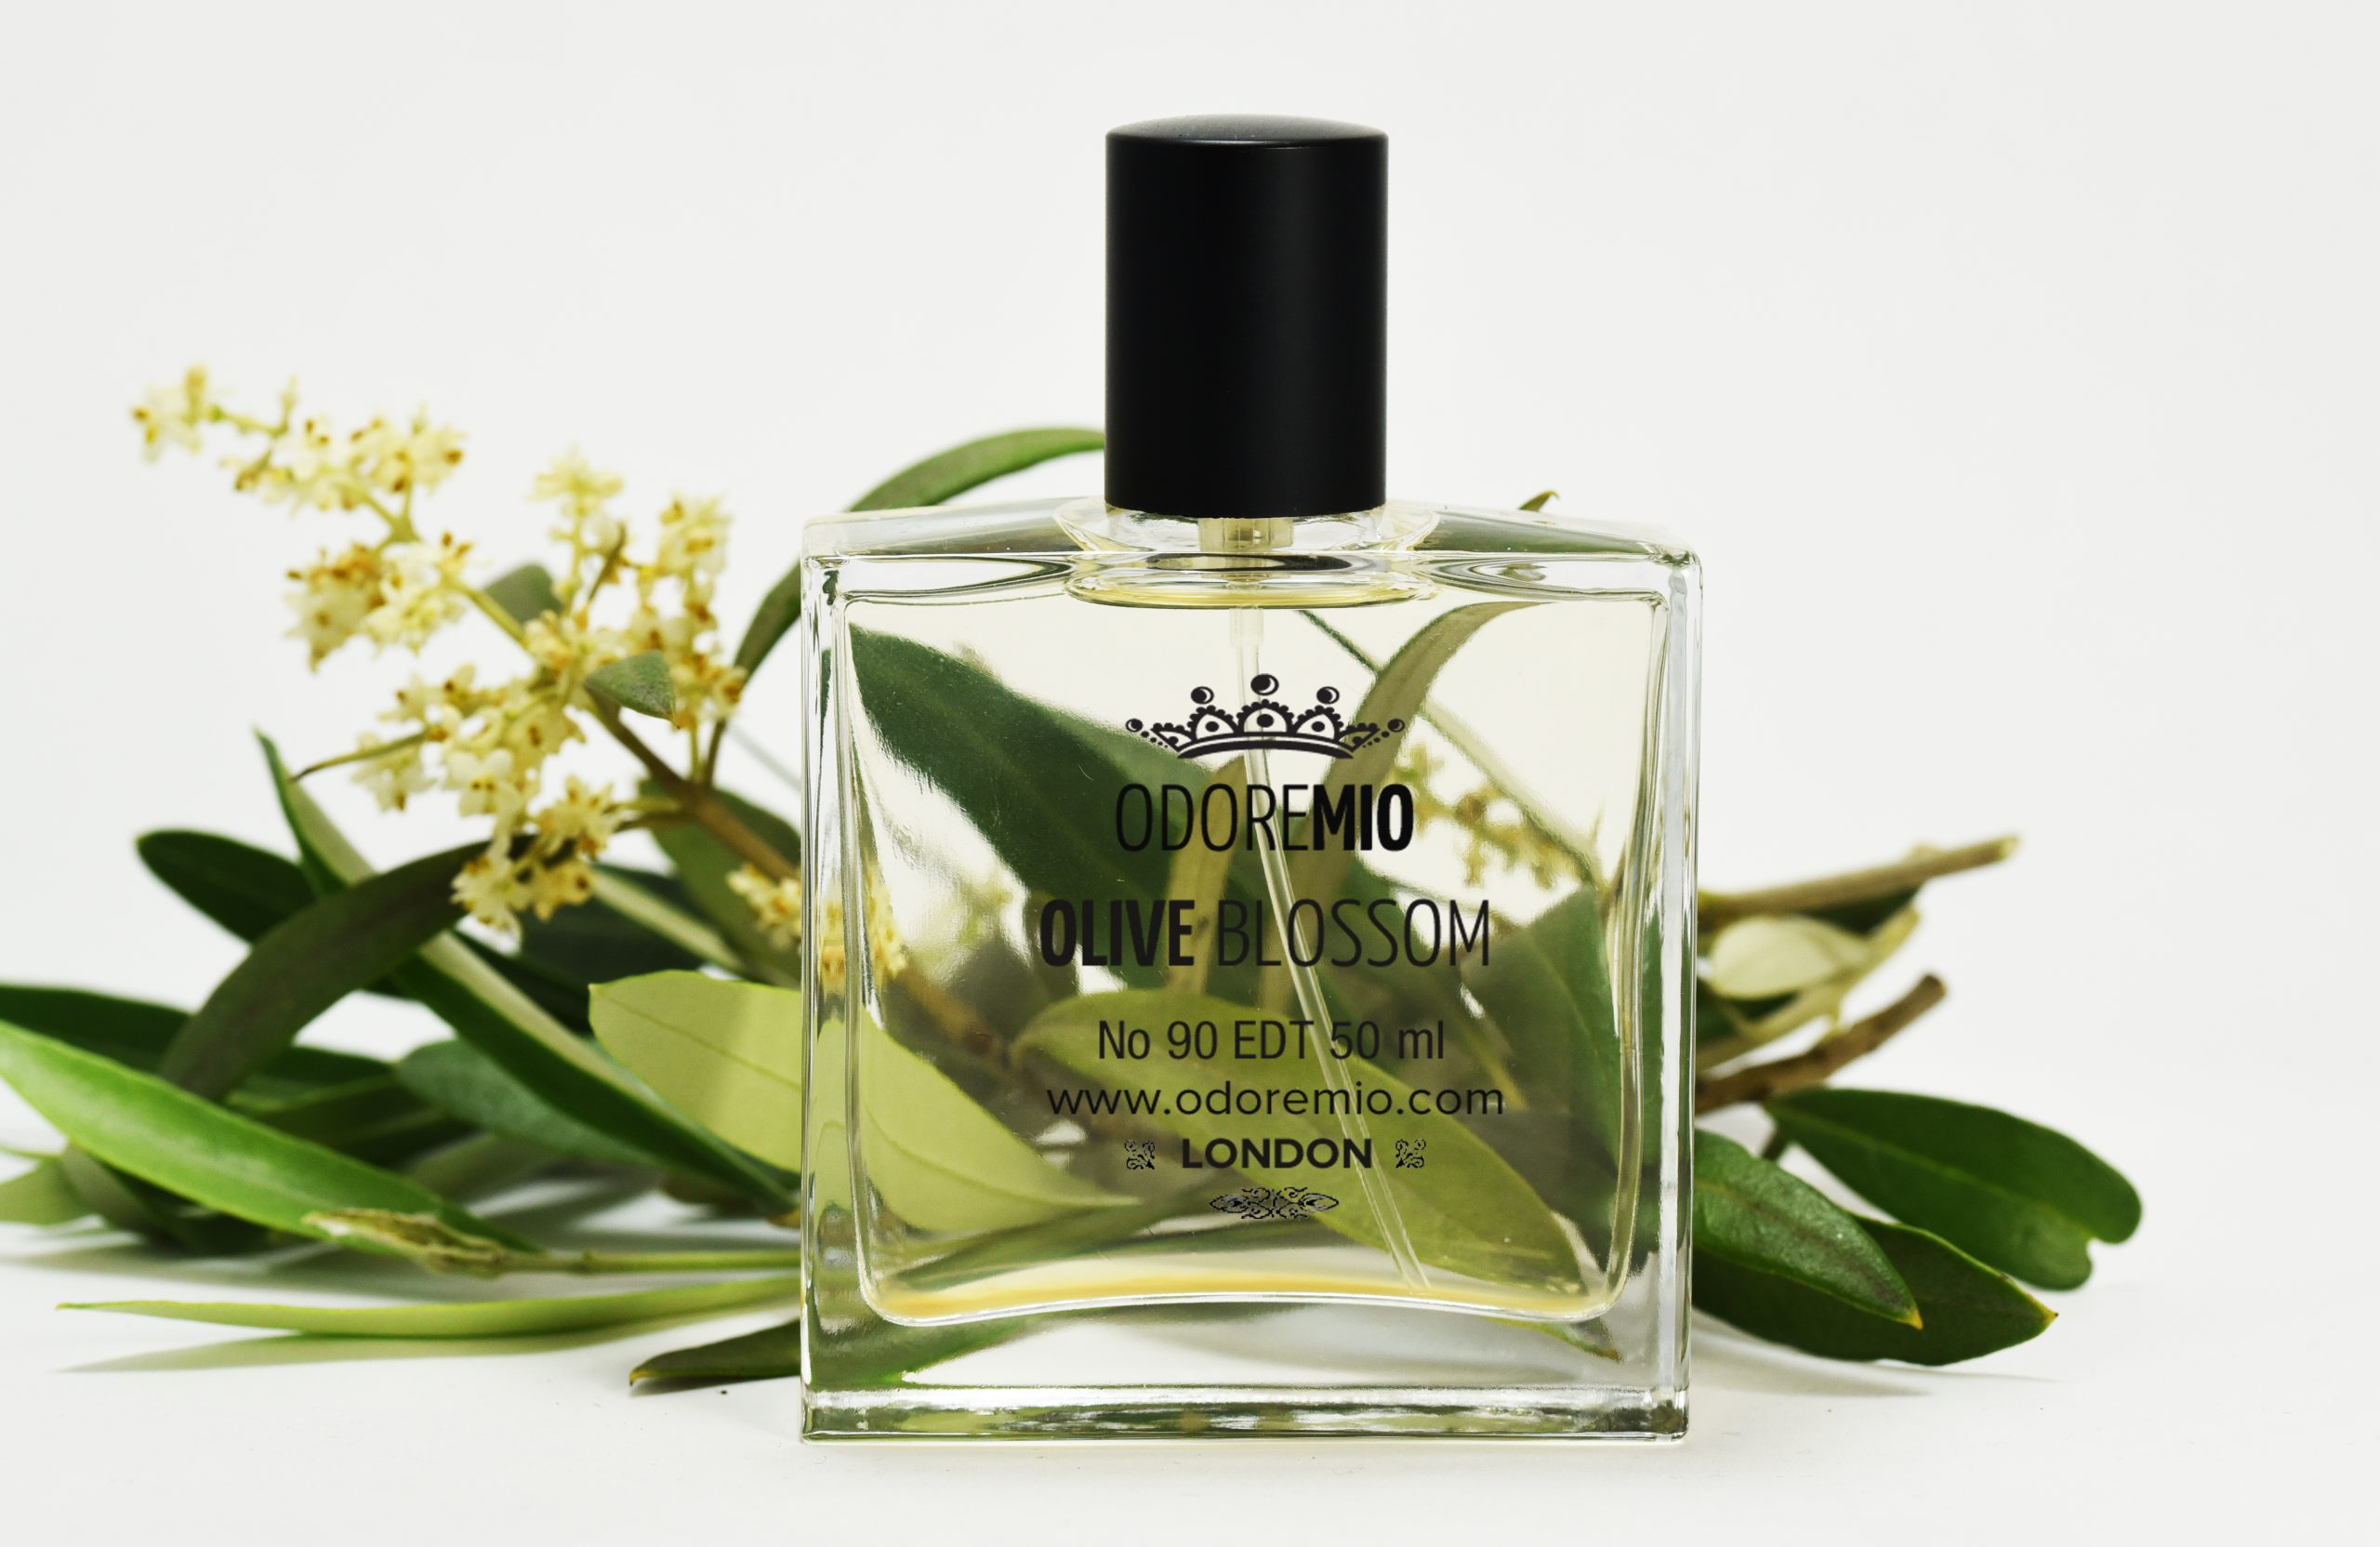 Olive Blossom Perfume